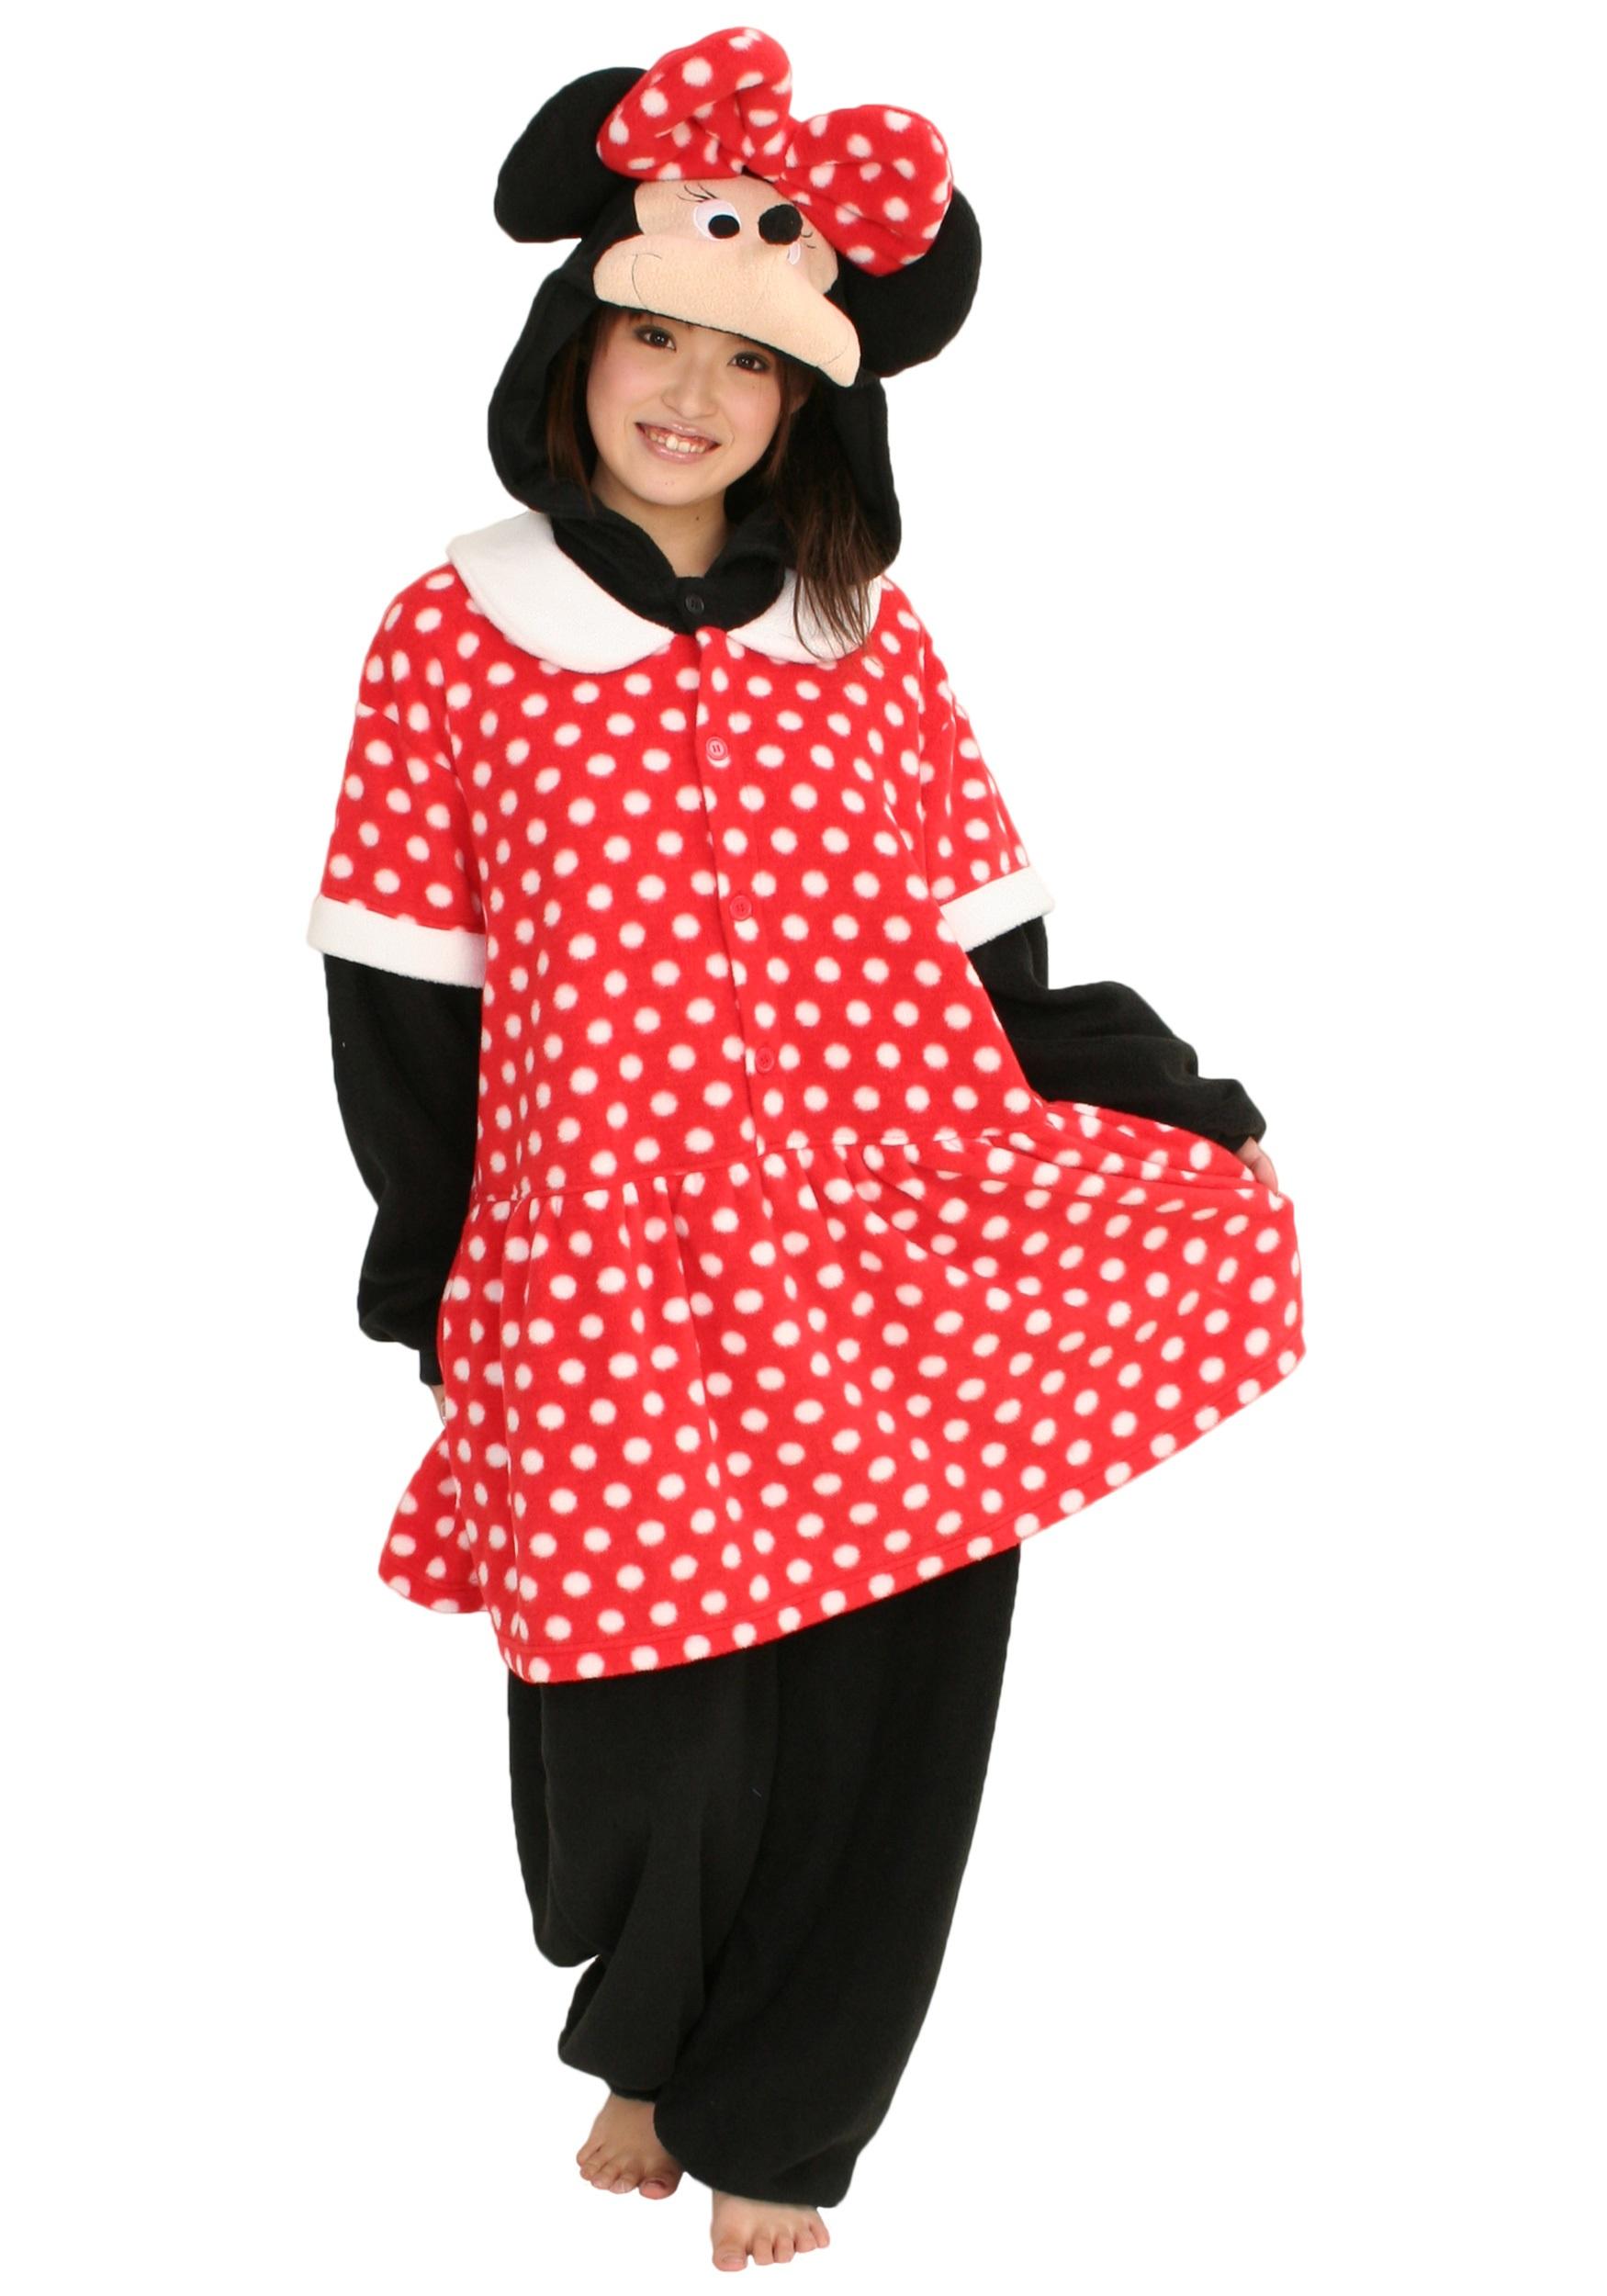 Minnie Mouse Kigurumi Pajamas for Adults